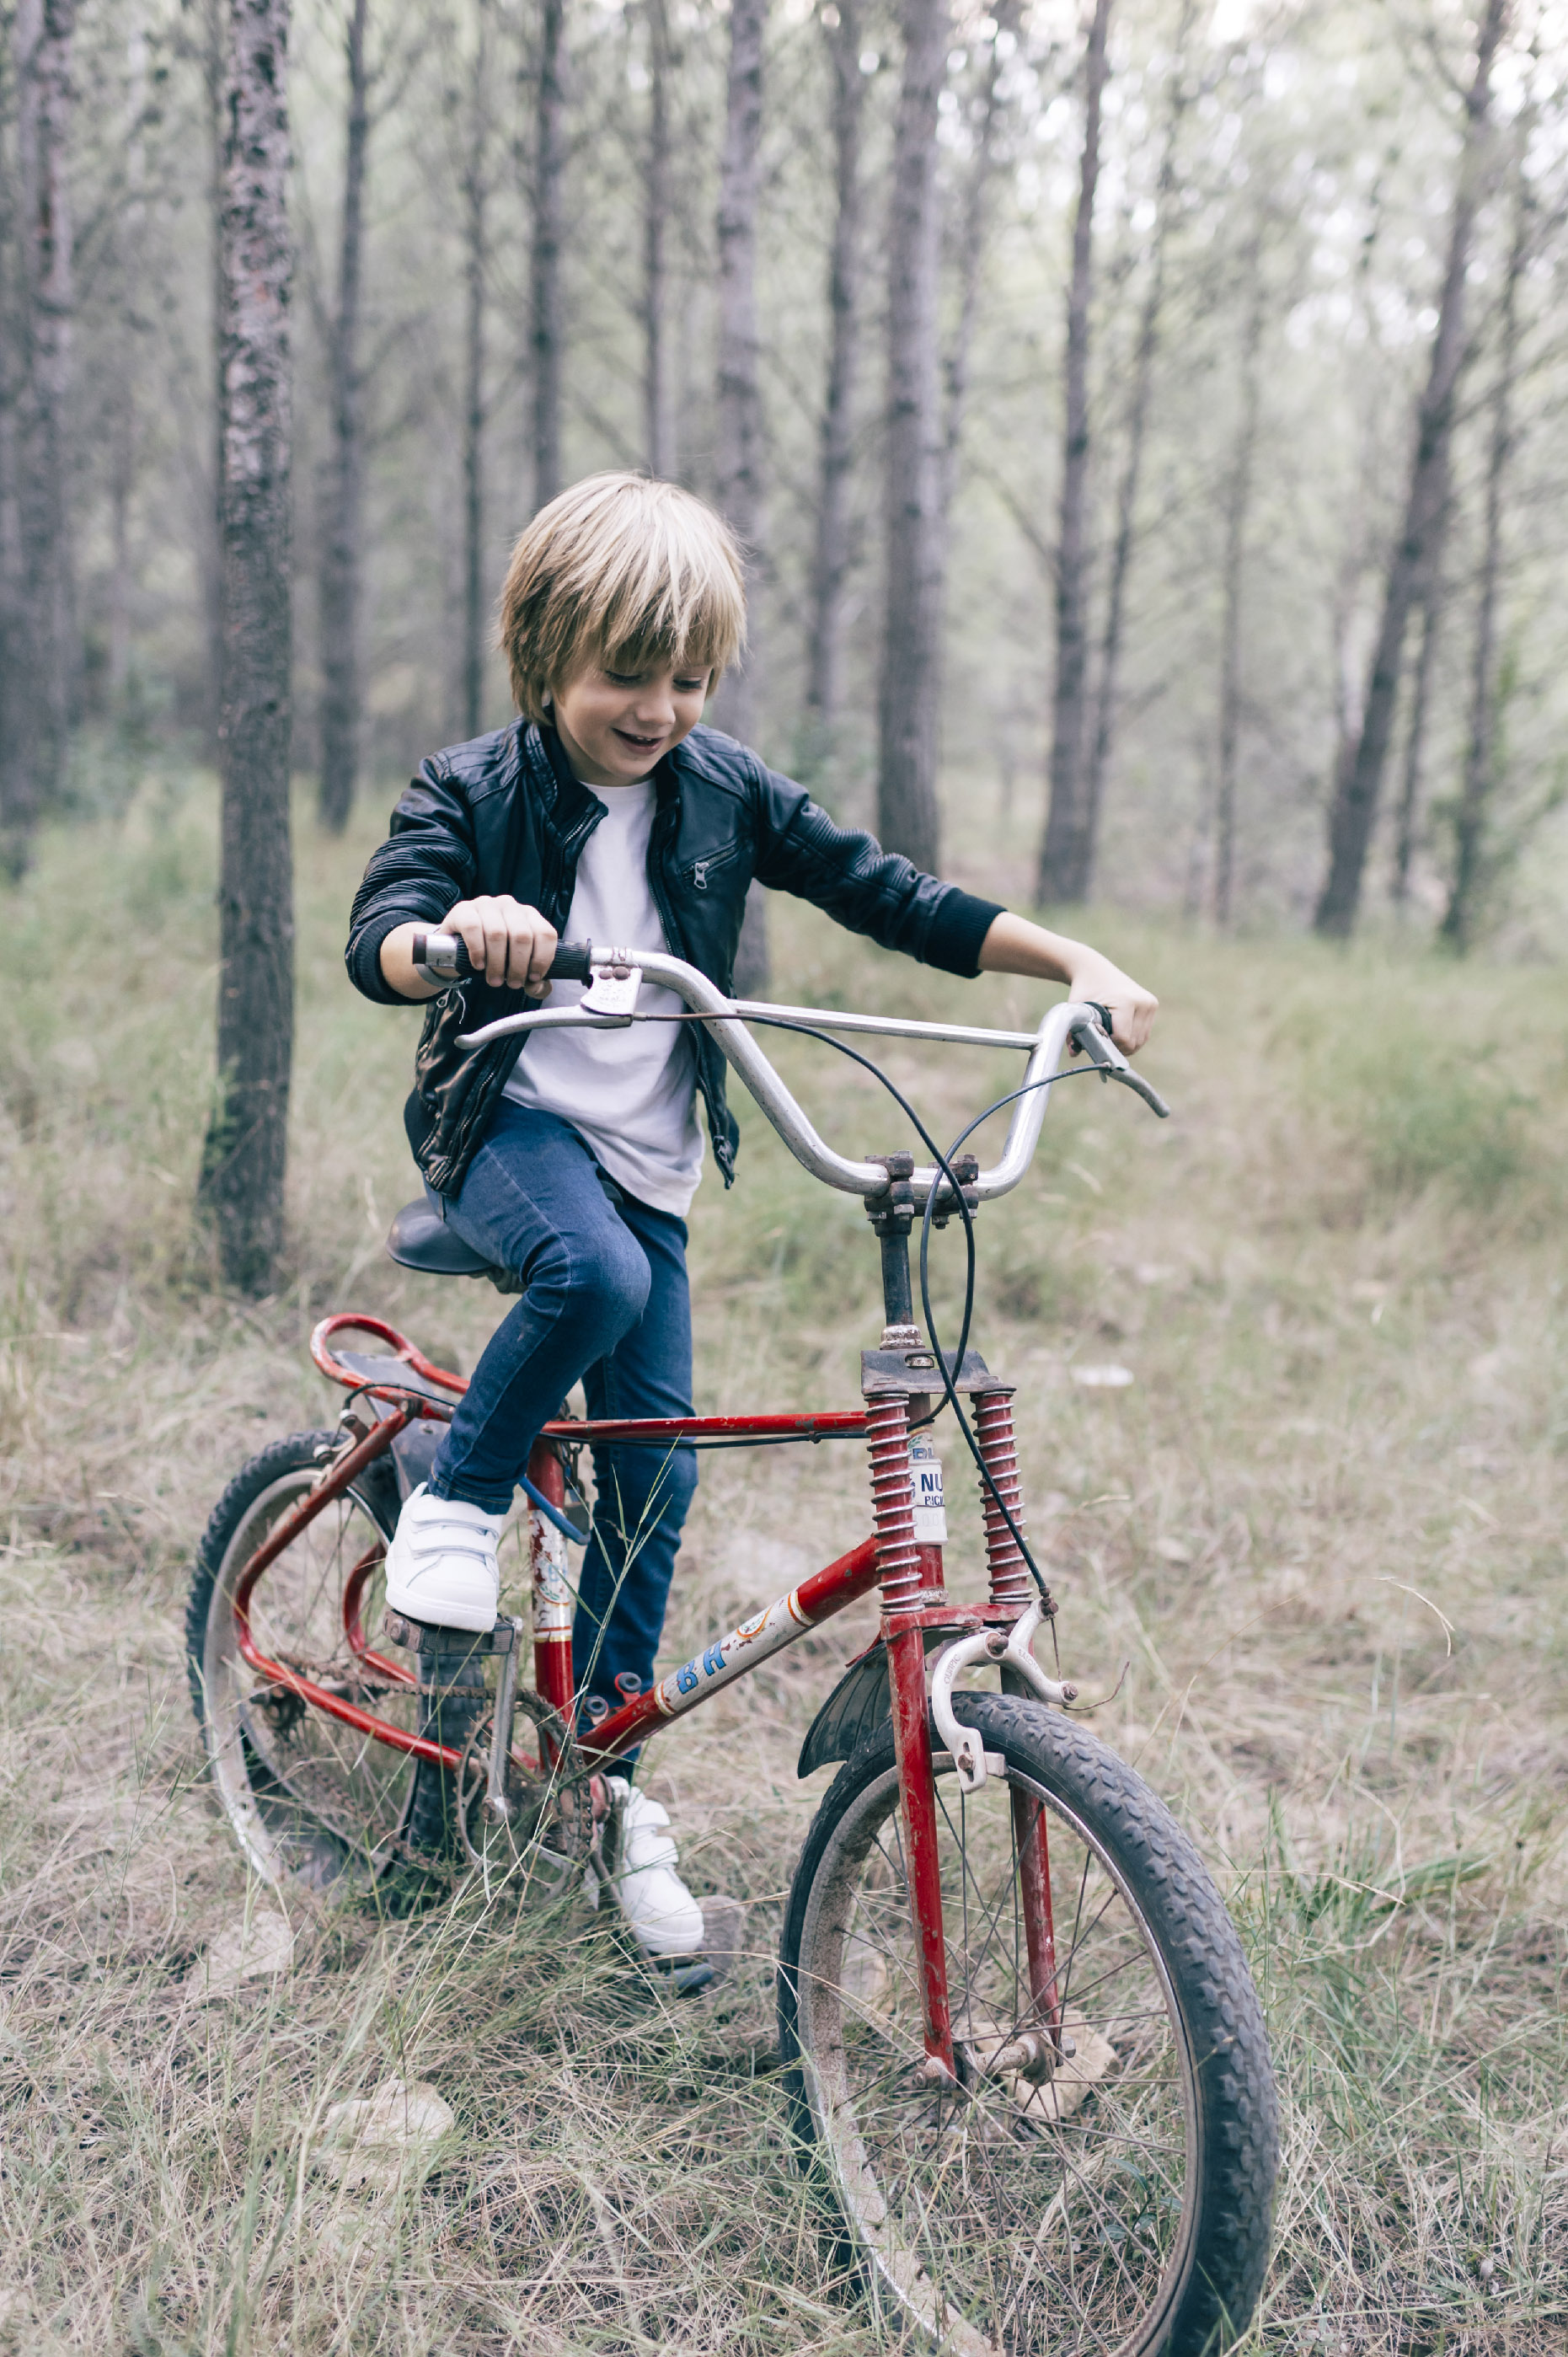 fotografia editorial moda models 8 freestyle bmx  marta mor fotografa castellon_03